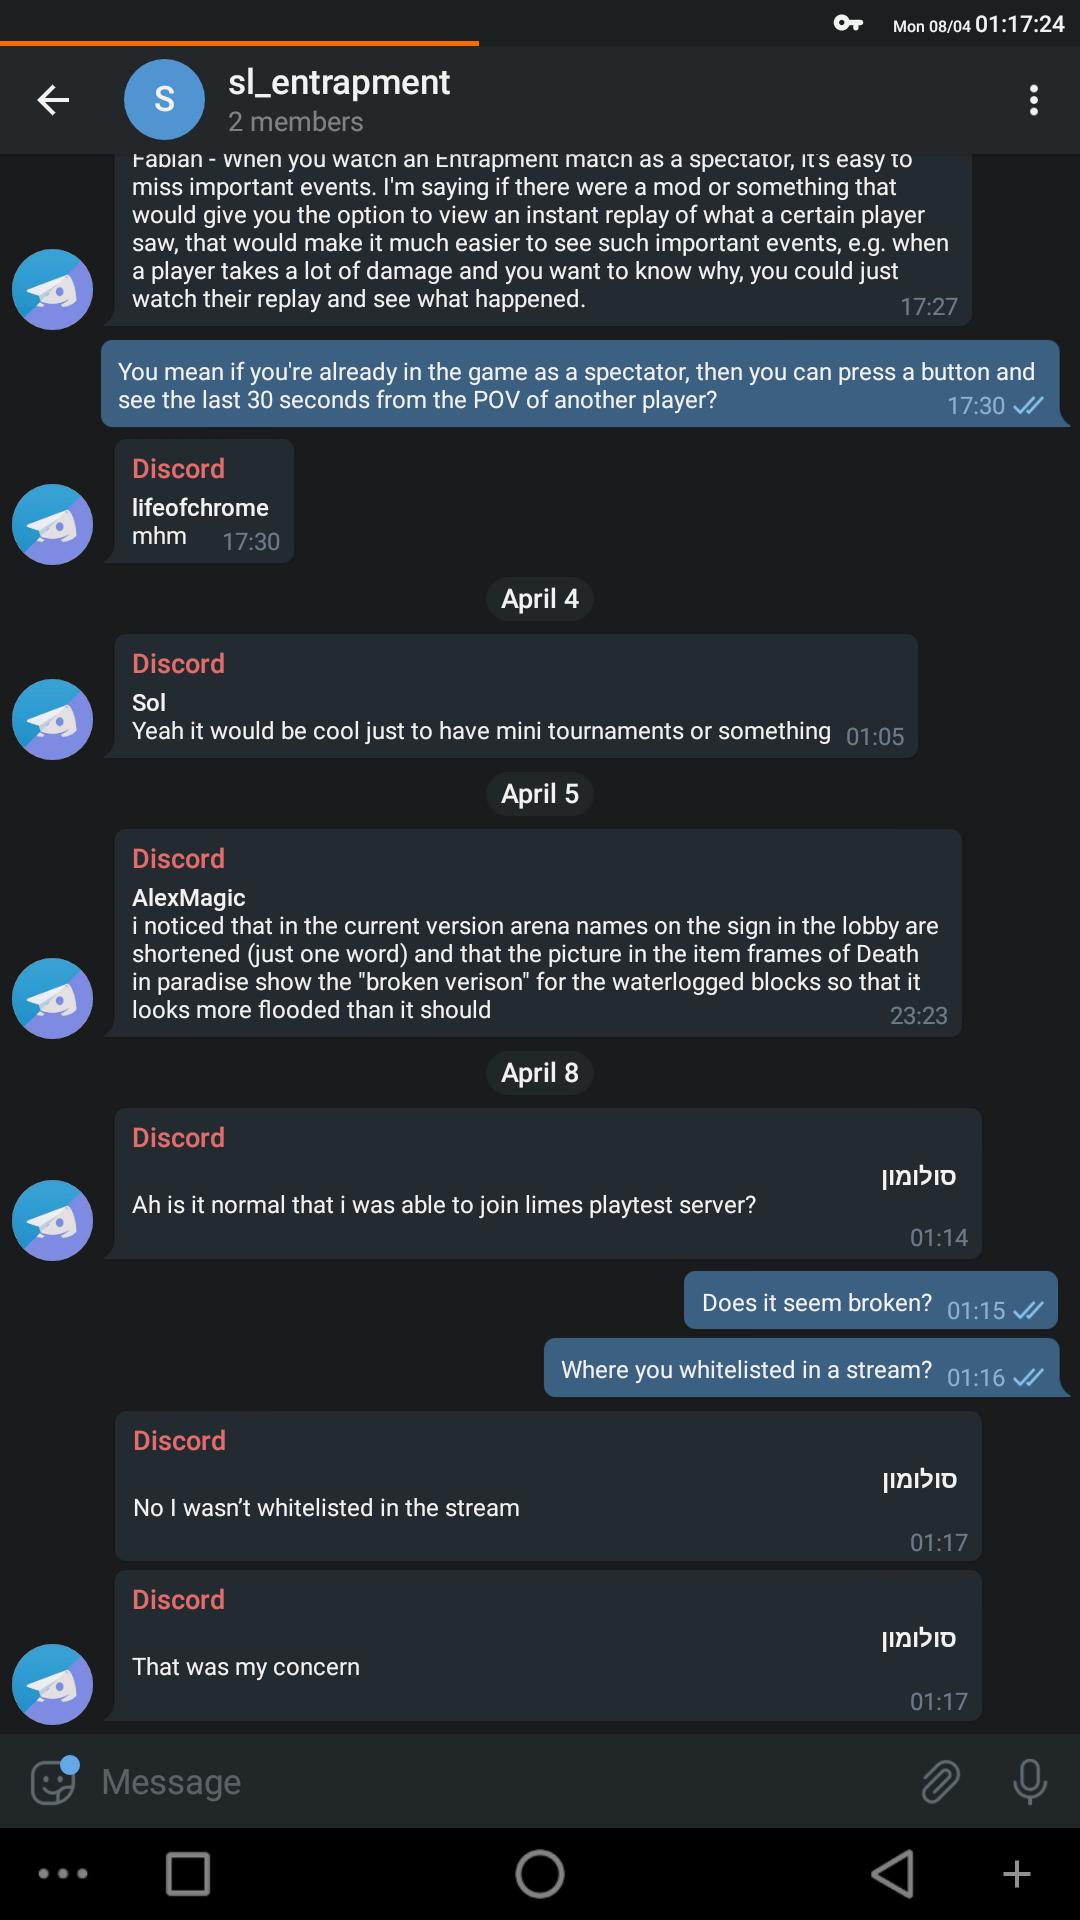 503 service unavailable fix discord